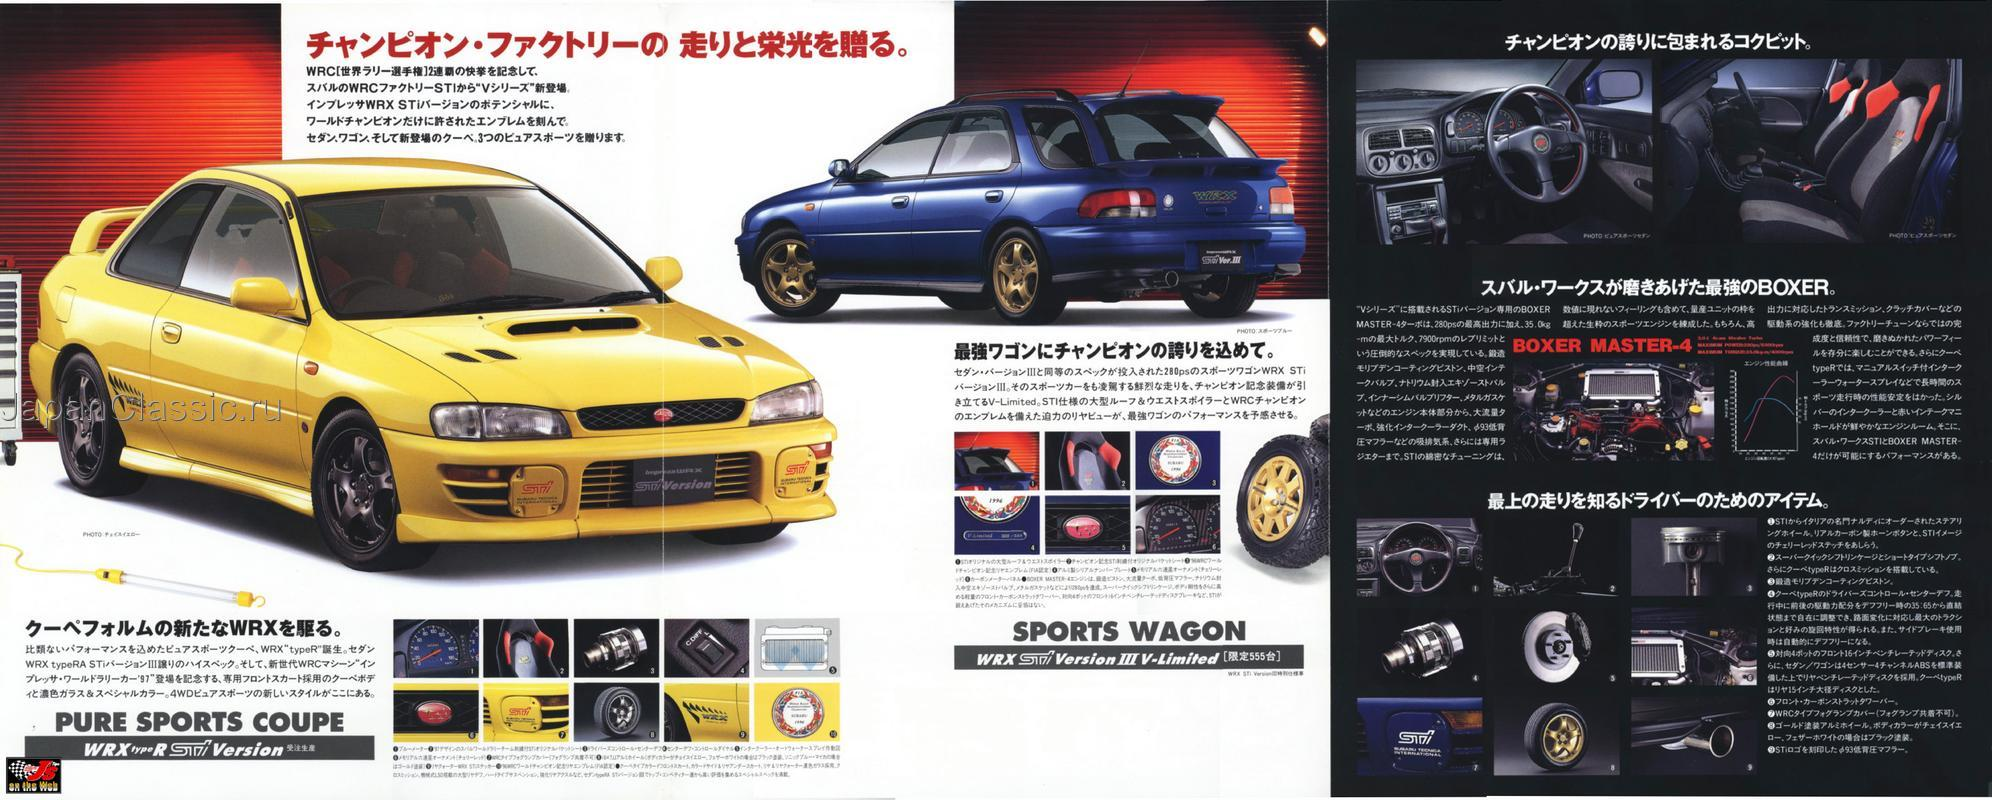 Subaru Impreza gcgf 1997 WRX-STI-VERSION3-V-LIMITED GC,GF ...